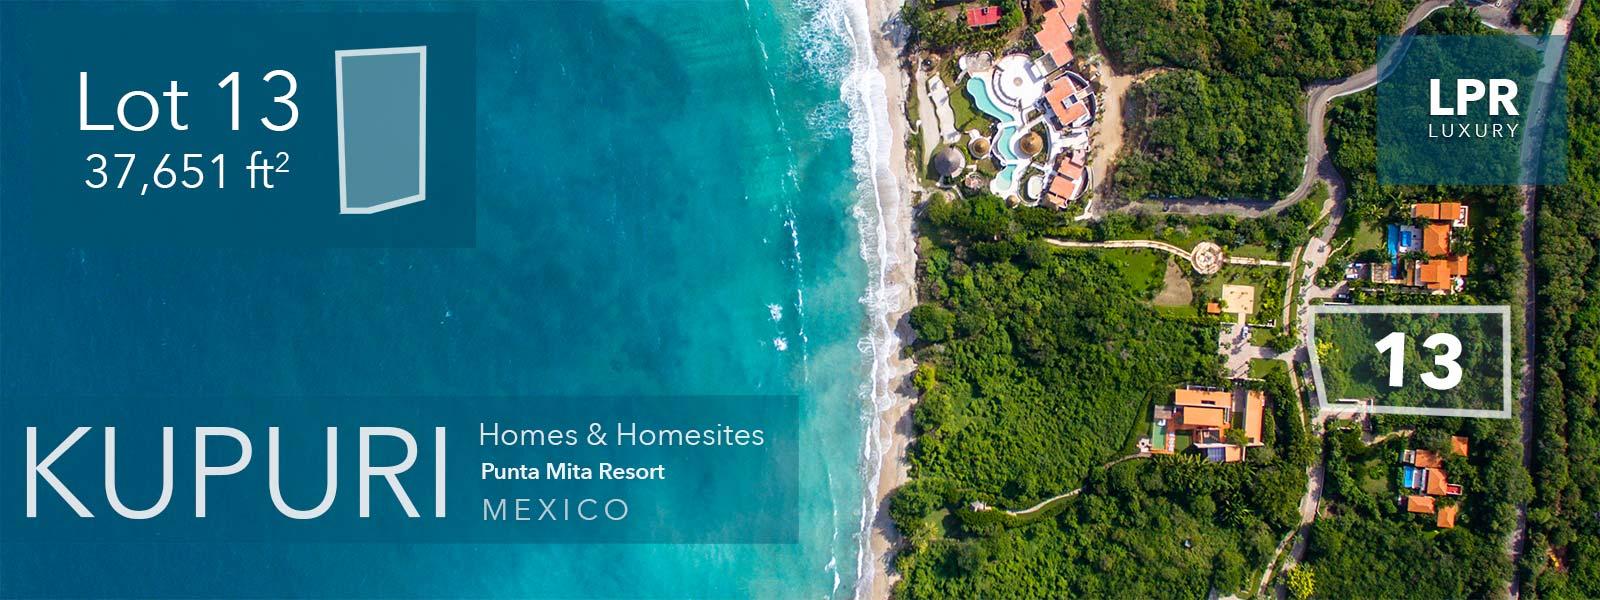 Kupuri Lot 13 - Punta Mita Real Estate : Luxury Resort Homes and Homesites